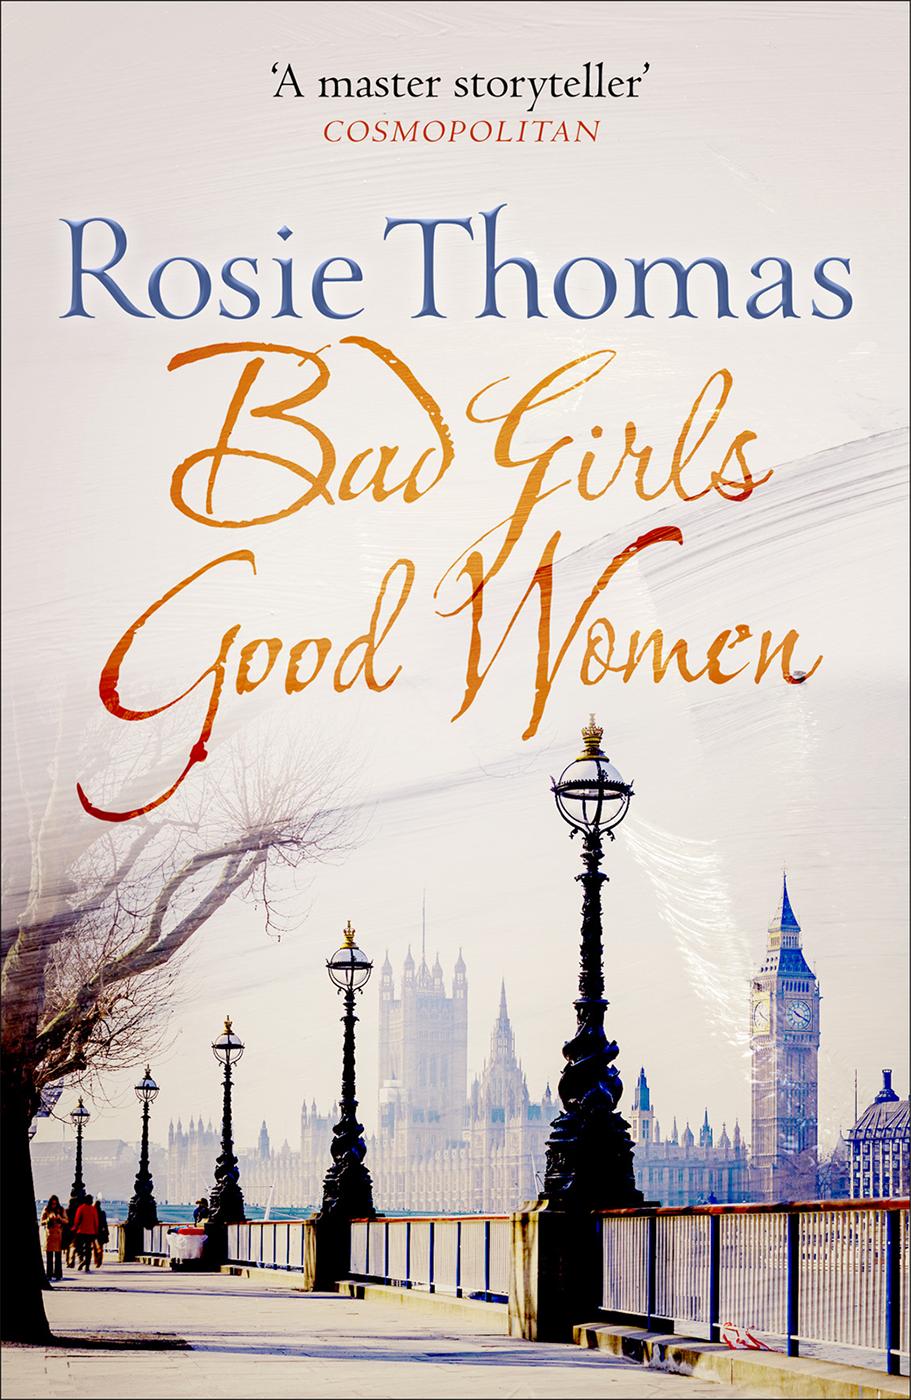 Rosie Thomas Bad Girls Good Women